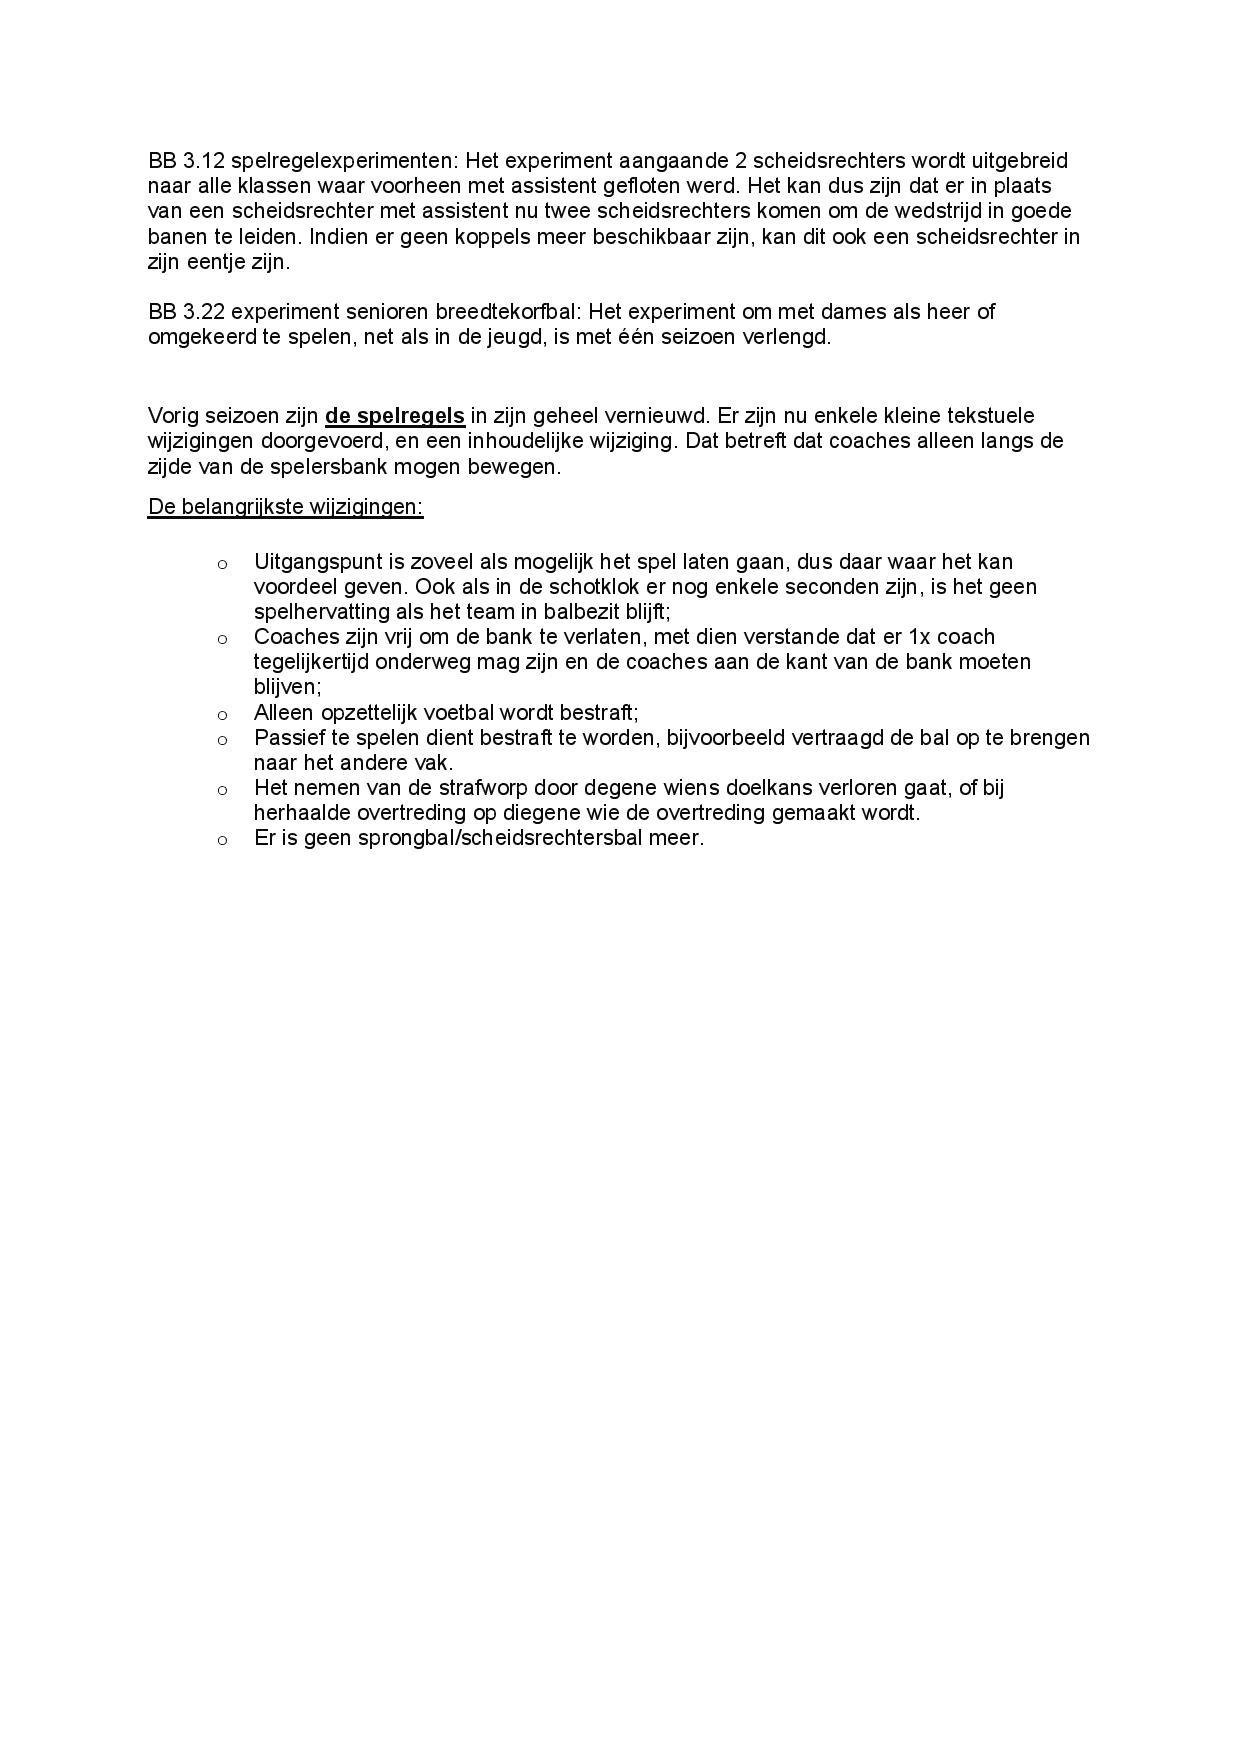 Spelregelwijziging 2021-2022